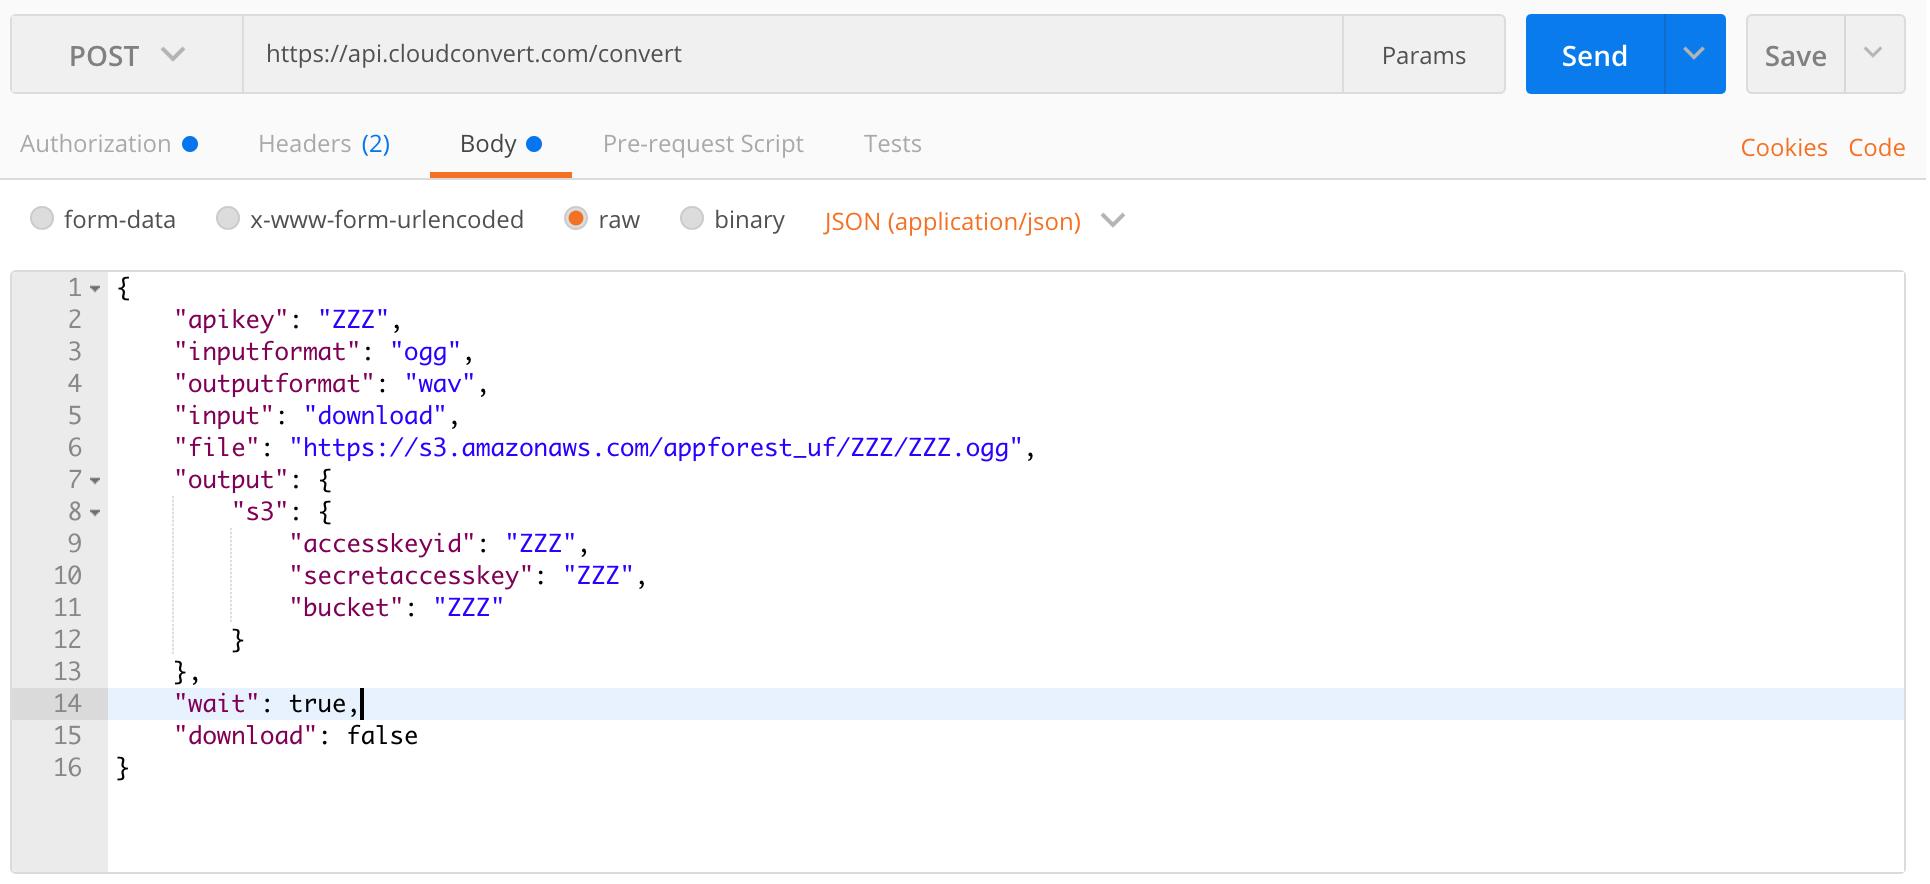 CloudConvert API: Call not working properly - APIs - Bubble Forum